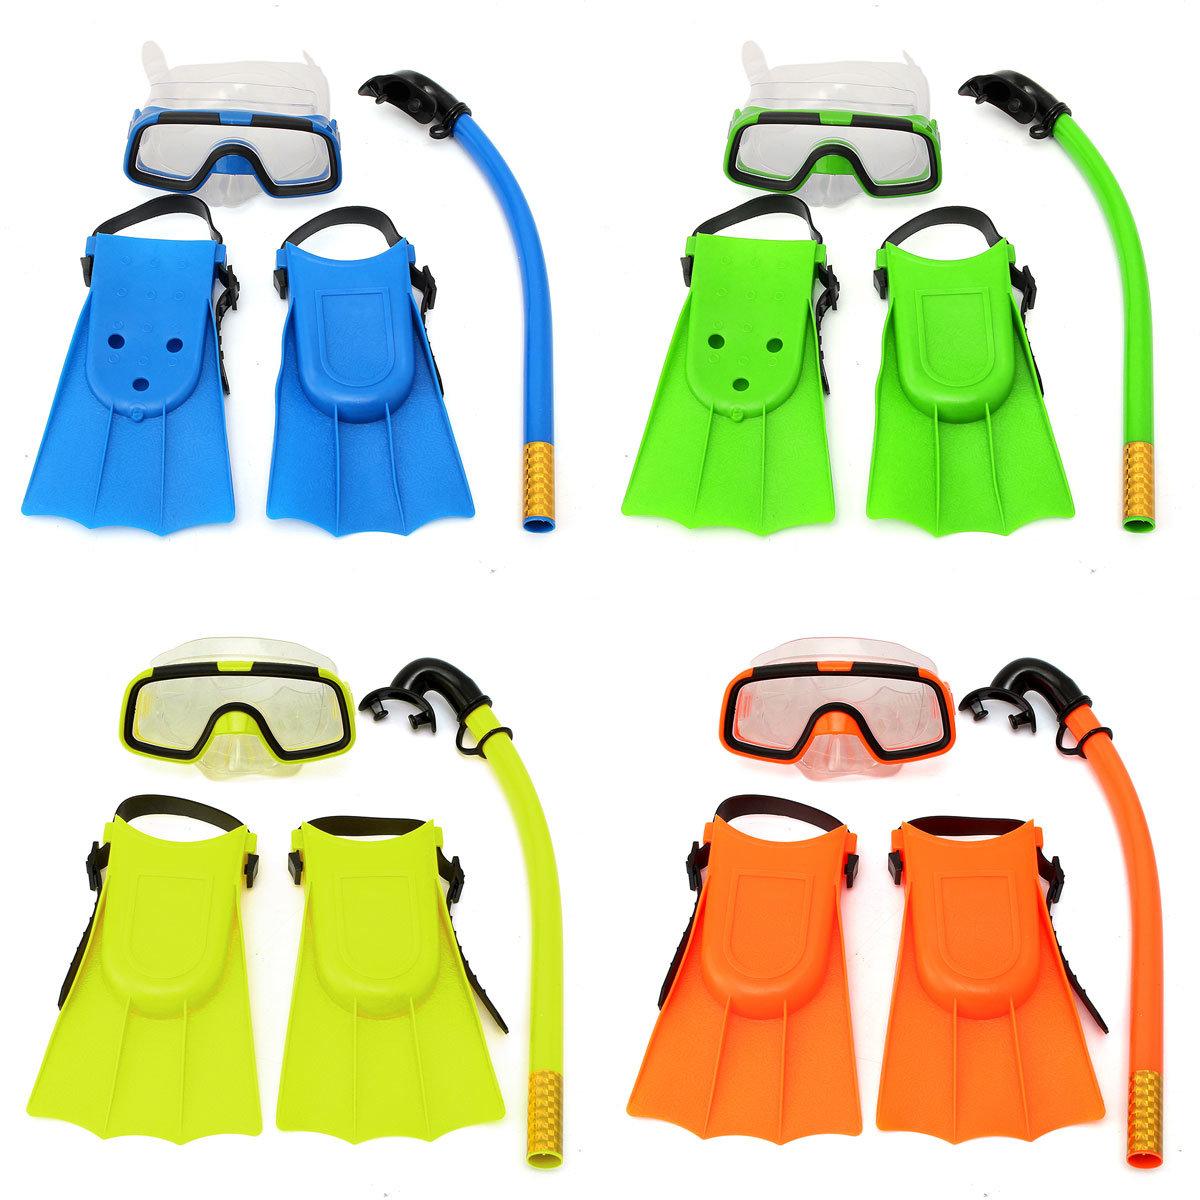 8701cec9c64 Junior Children Snorkeling Set Diving Mask Goggles Flippers Scuba Swimming  Diving Kids Set COD